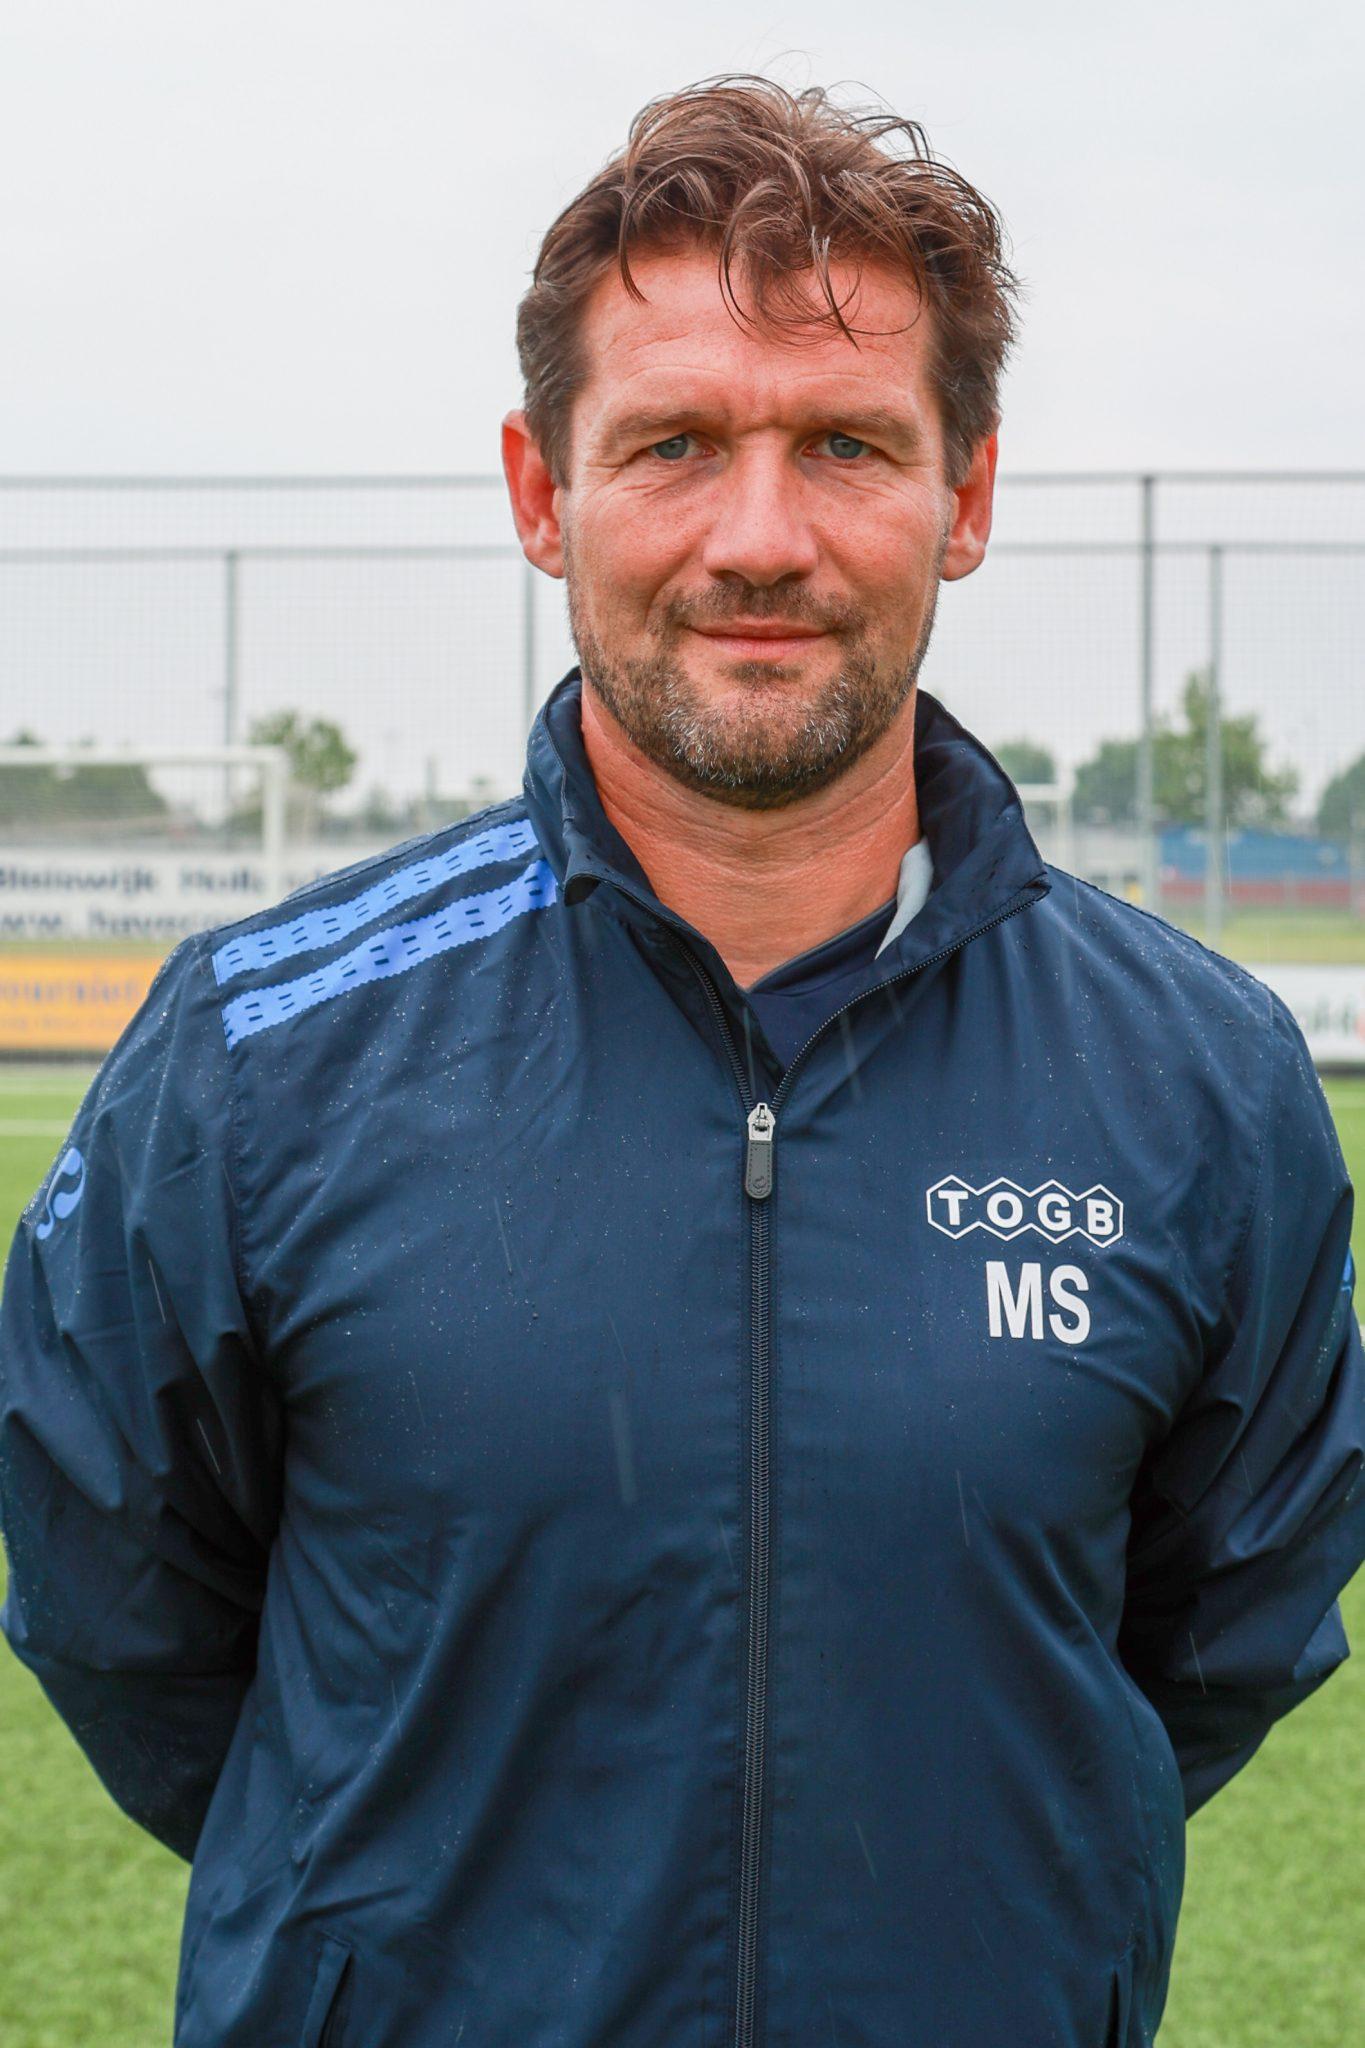 TOGB ingedeeld in Hoofdklasse A voor seizoen 2021-2022